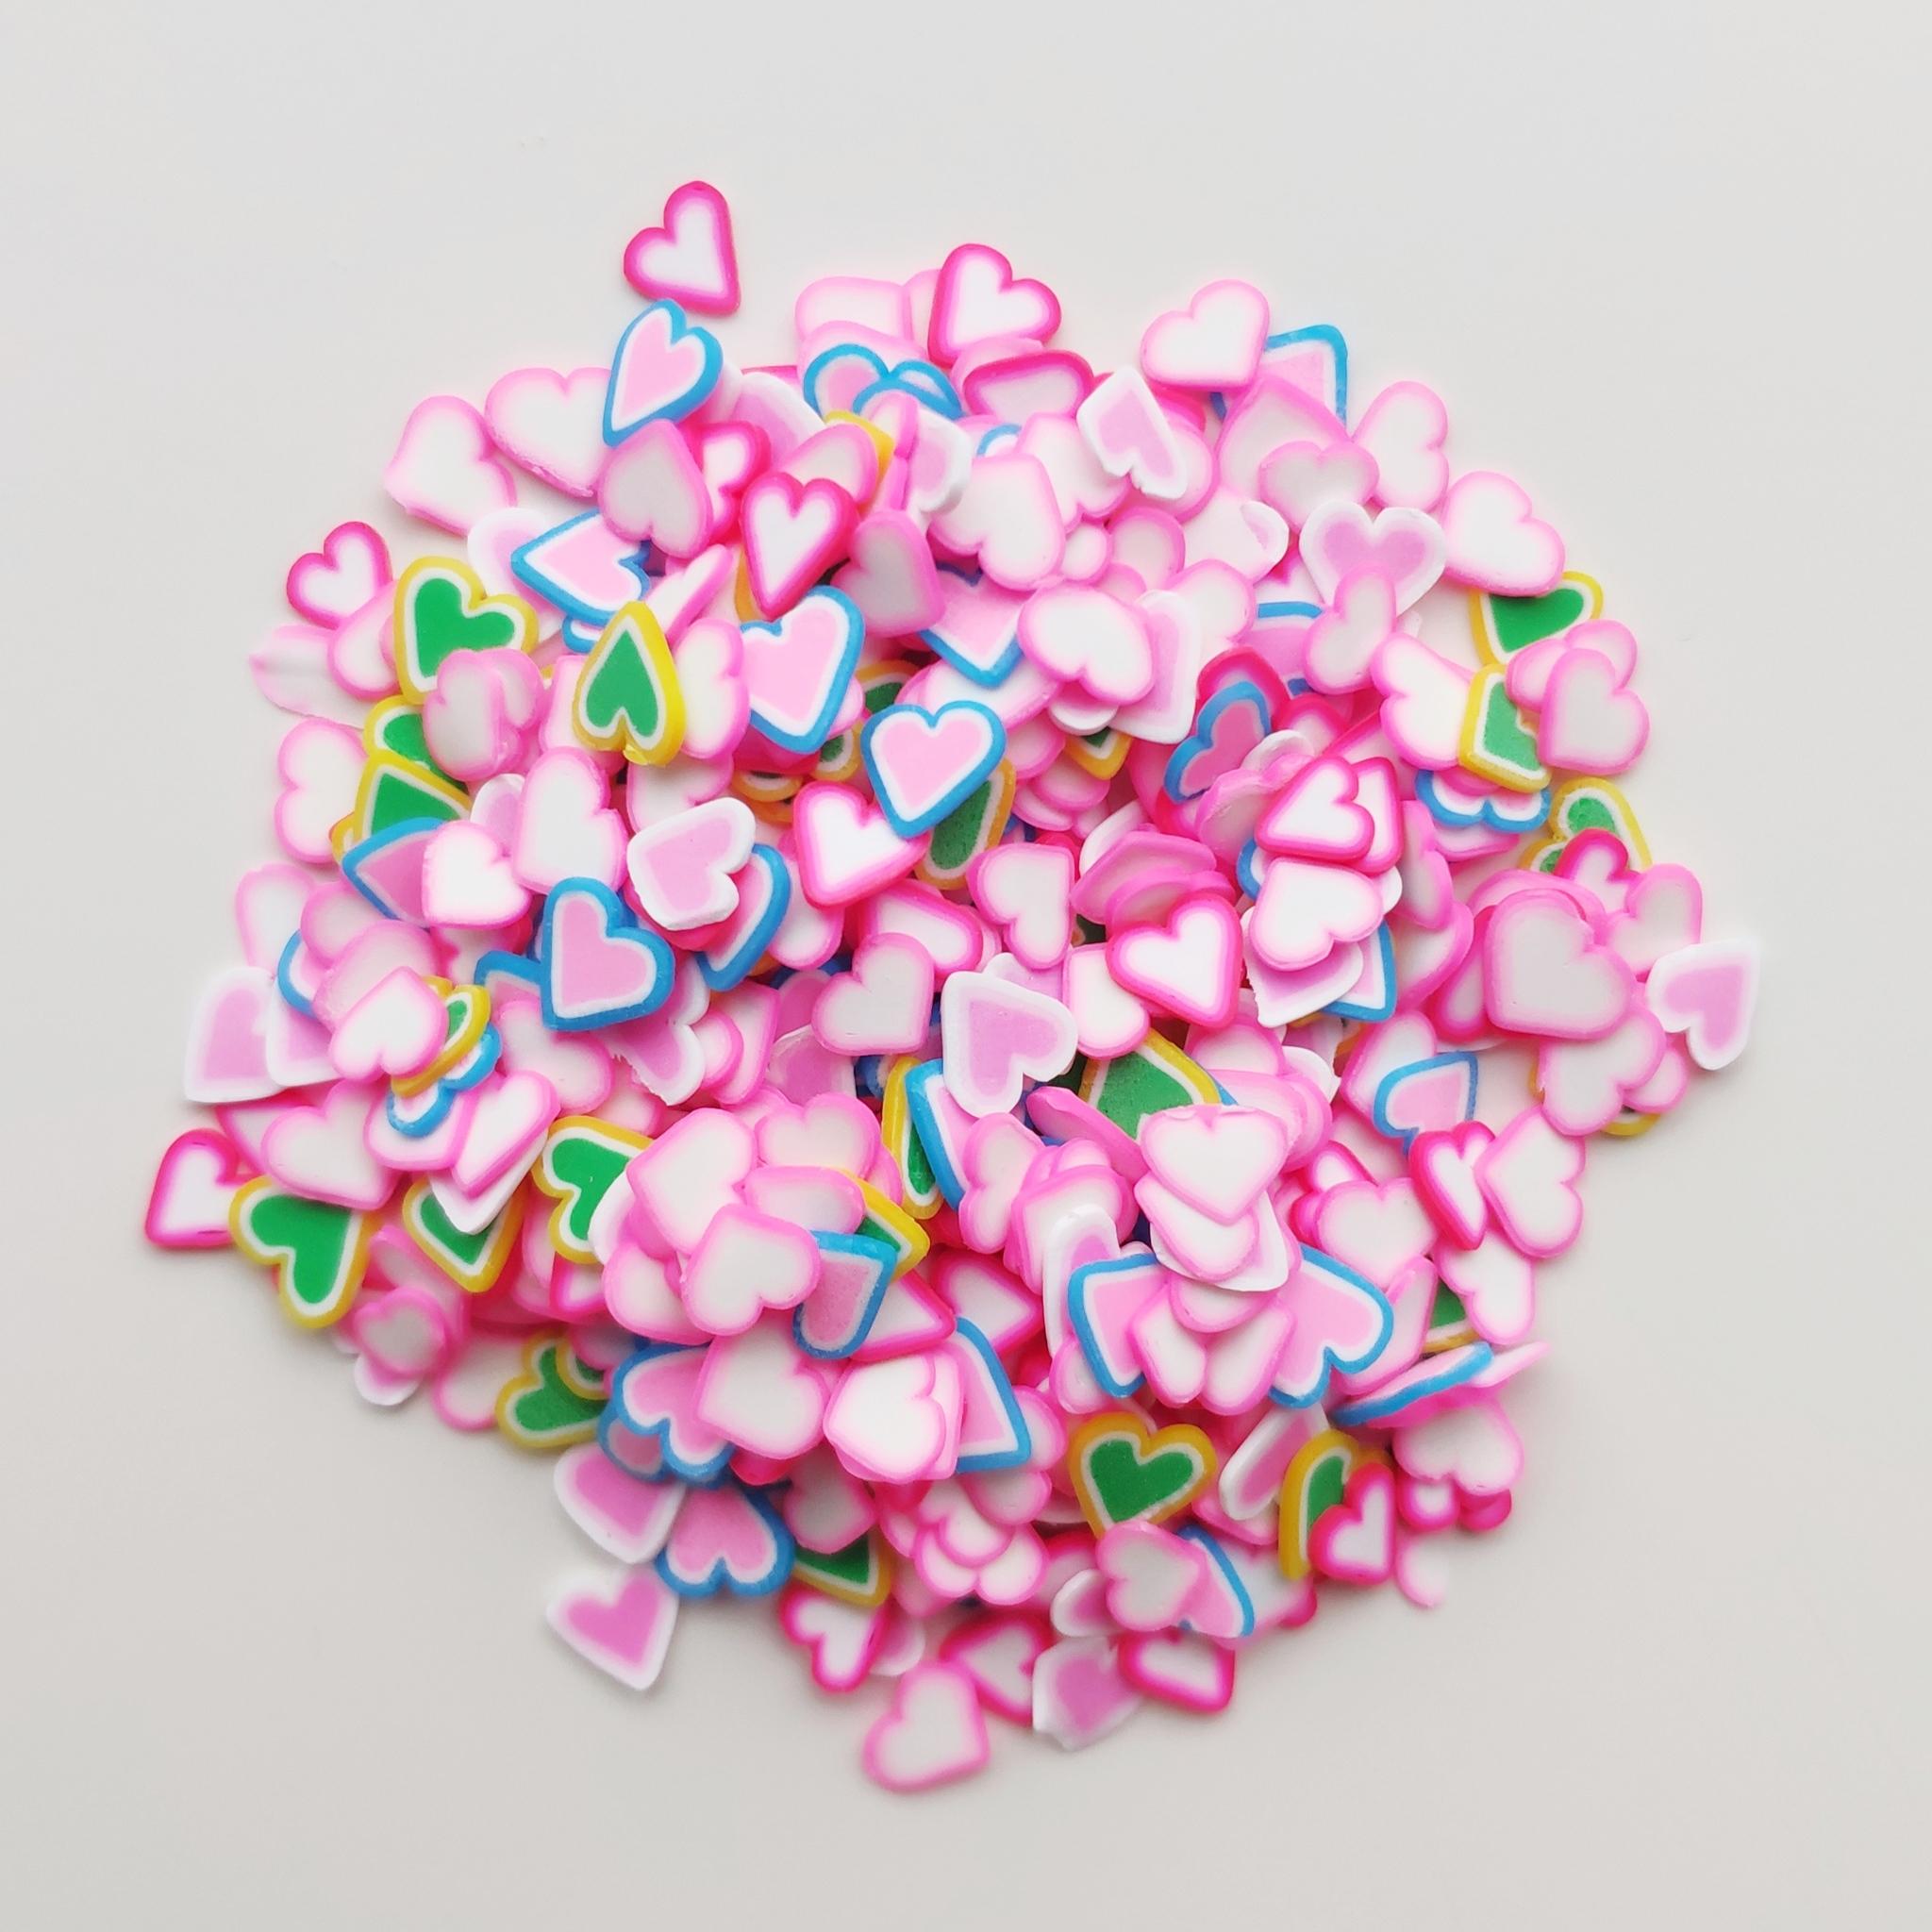 Посыпка фимо для слайма сердечки розовый микс 30 мл